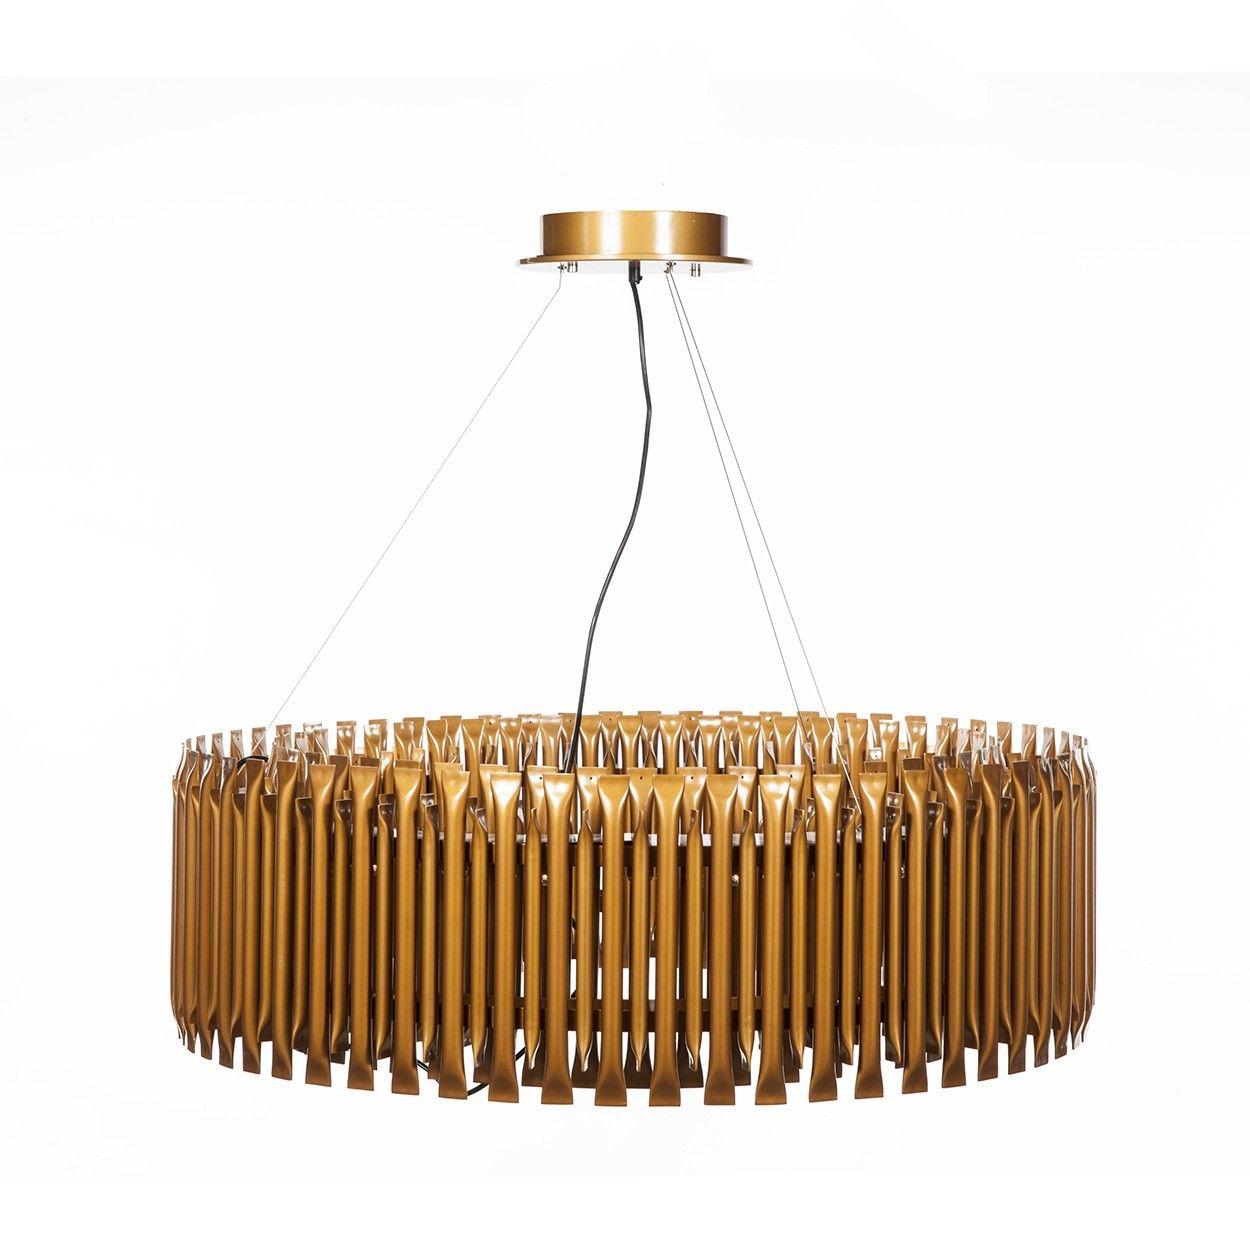 Matheny suspension chandelier single tier chandeliers lights matheny suspension chandelier single tier aloadofball Choice Image